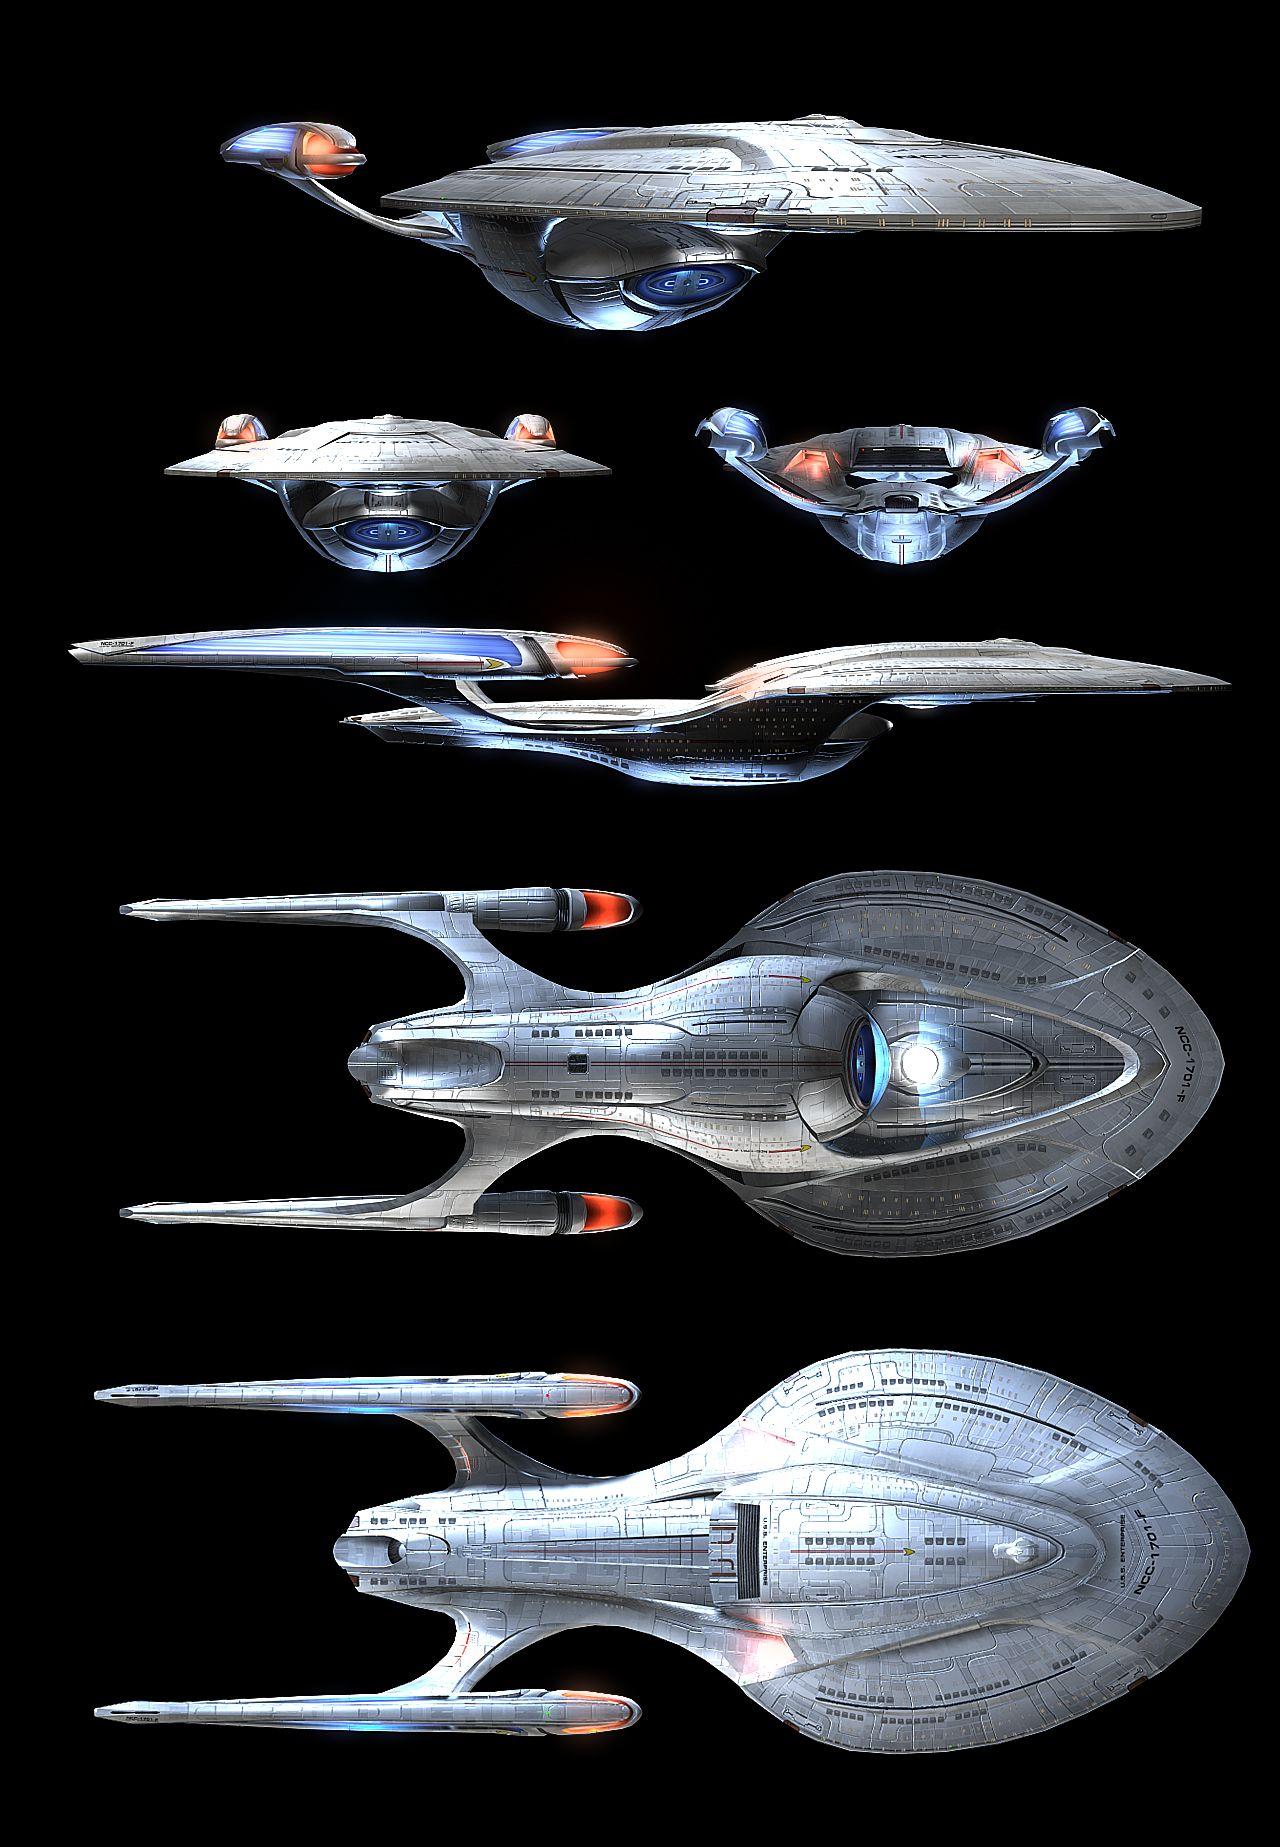 odyssey class starship : uss enterprise ncc-1701f | mechs, Schematic